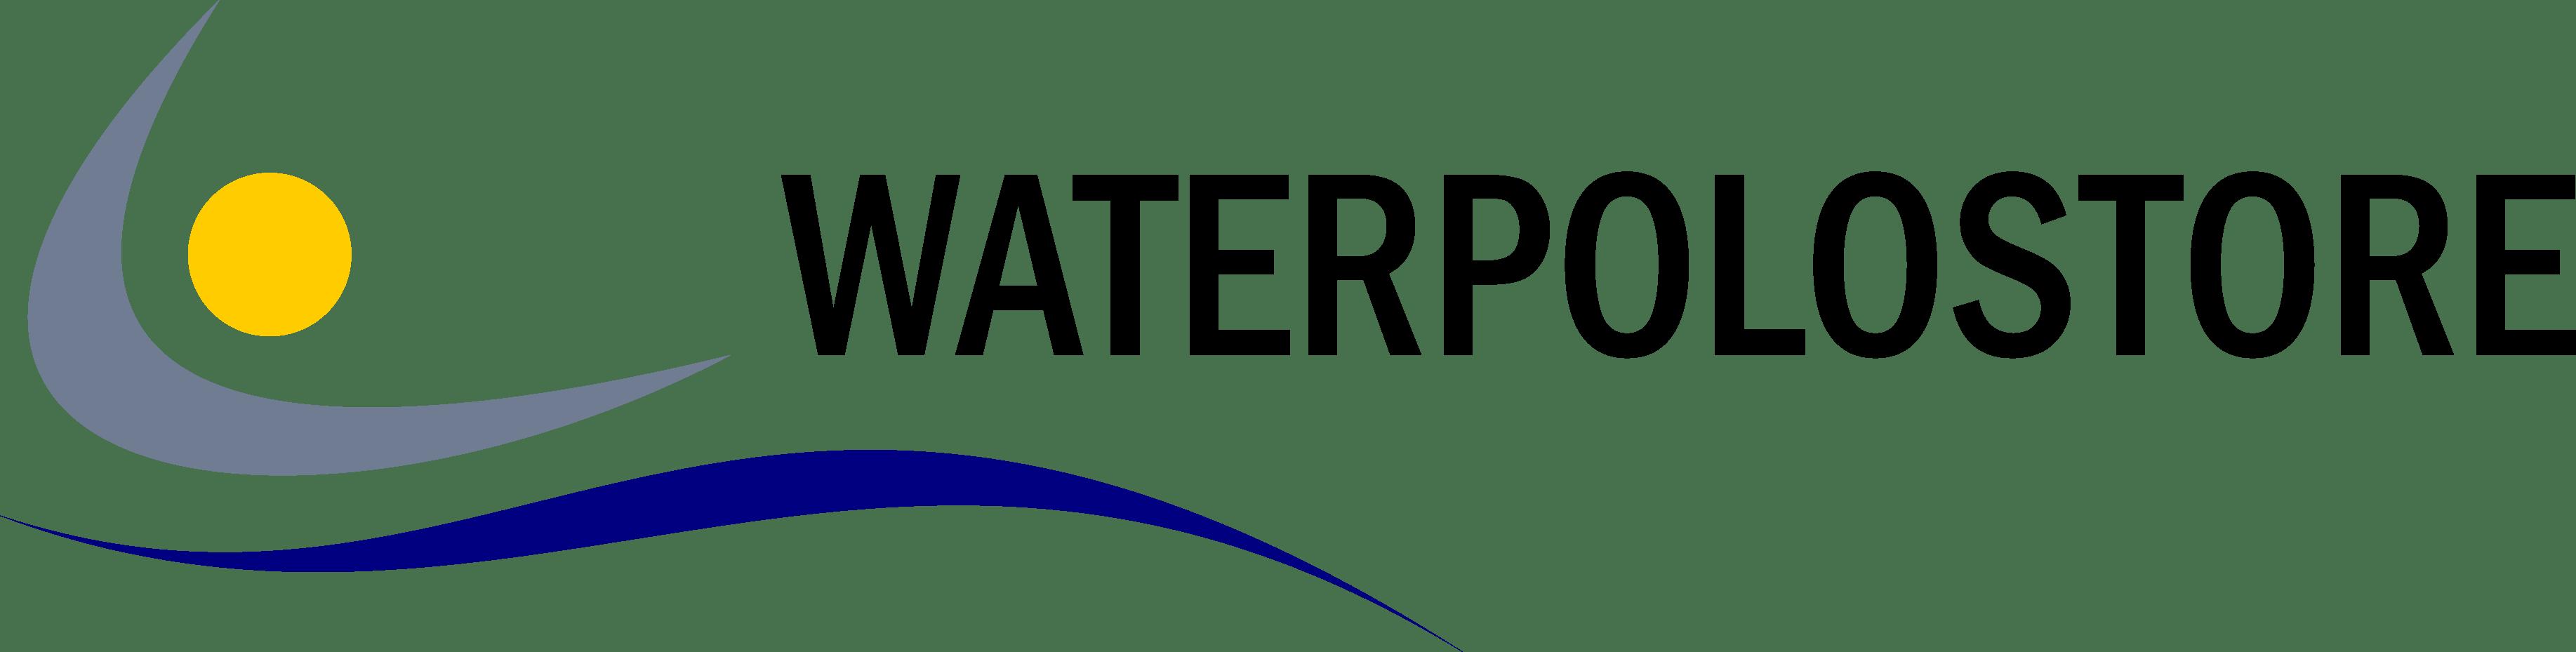 waterpolostore